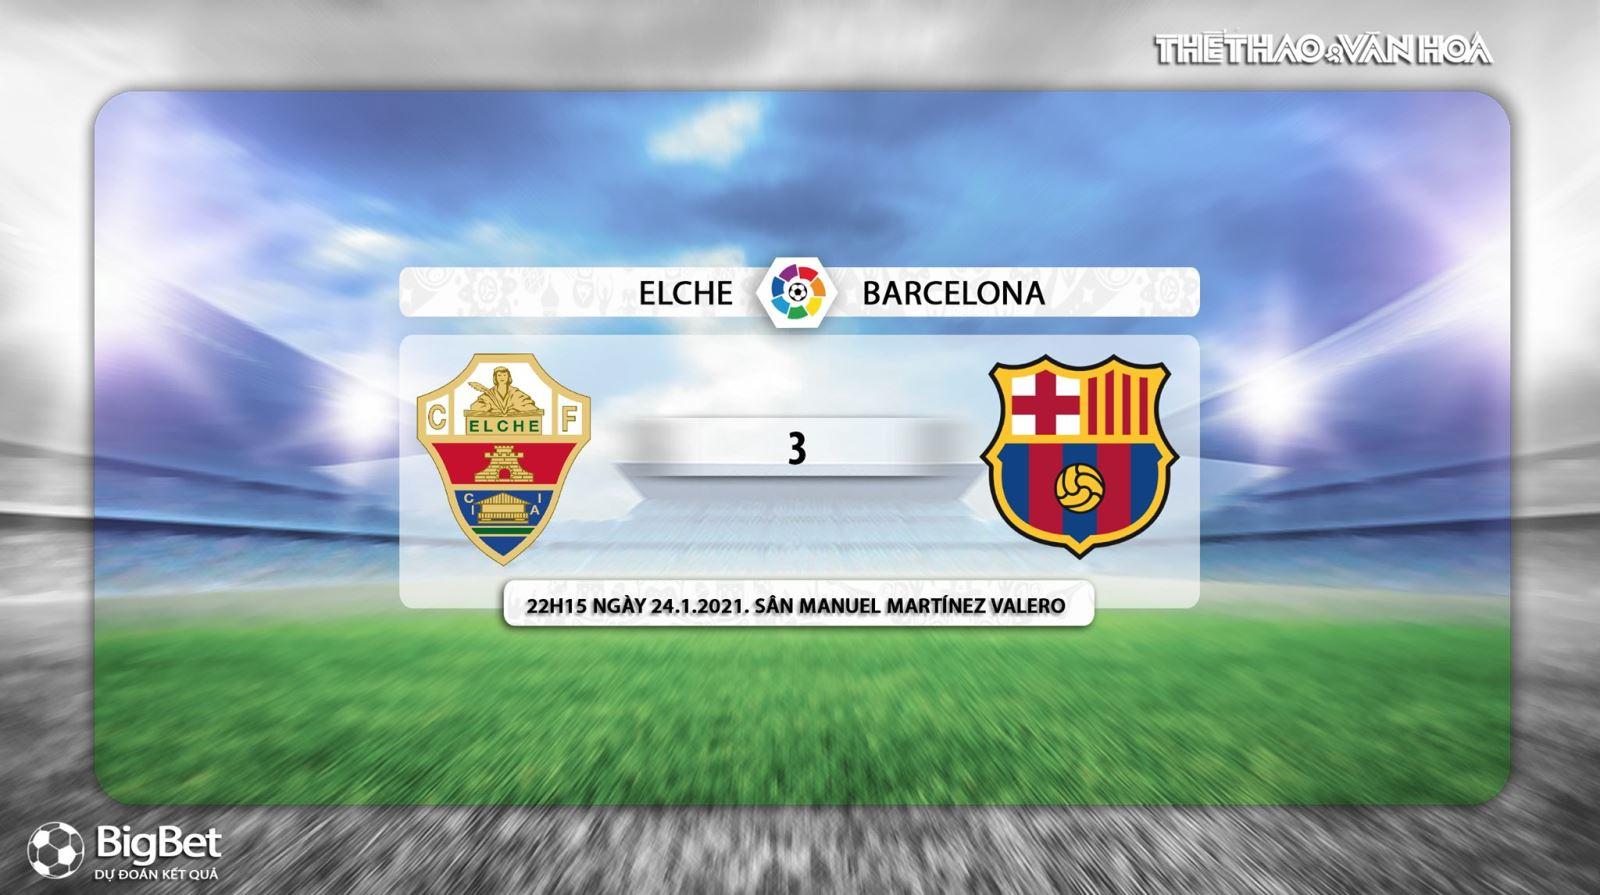 Link Tr U1ef1c Ti U1ebfp Elche Vs Barcelona B U0110TV Tr U1ef1c Ti U1ebfp B U00f3ng U0111 U00e1